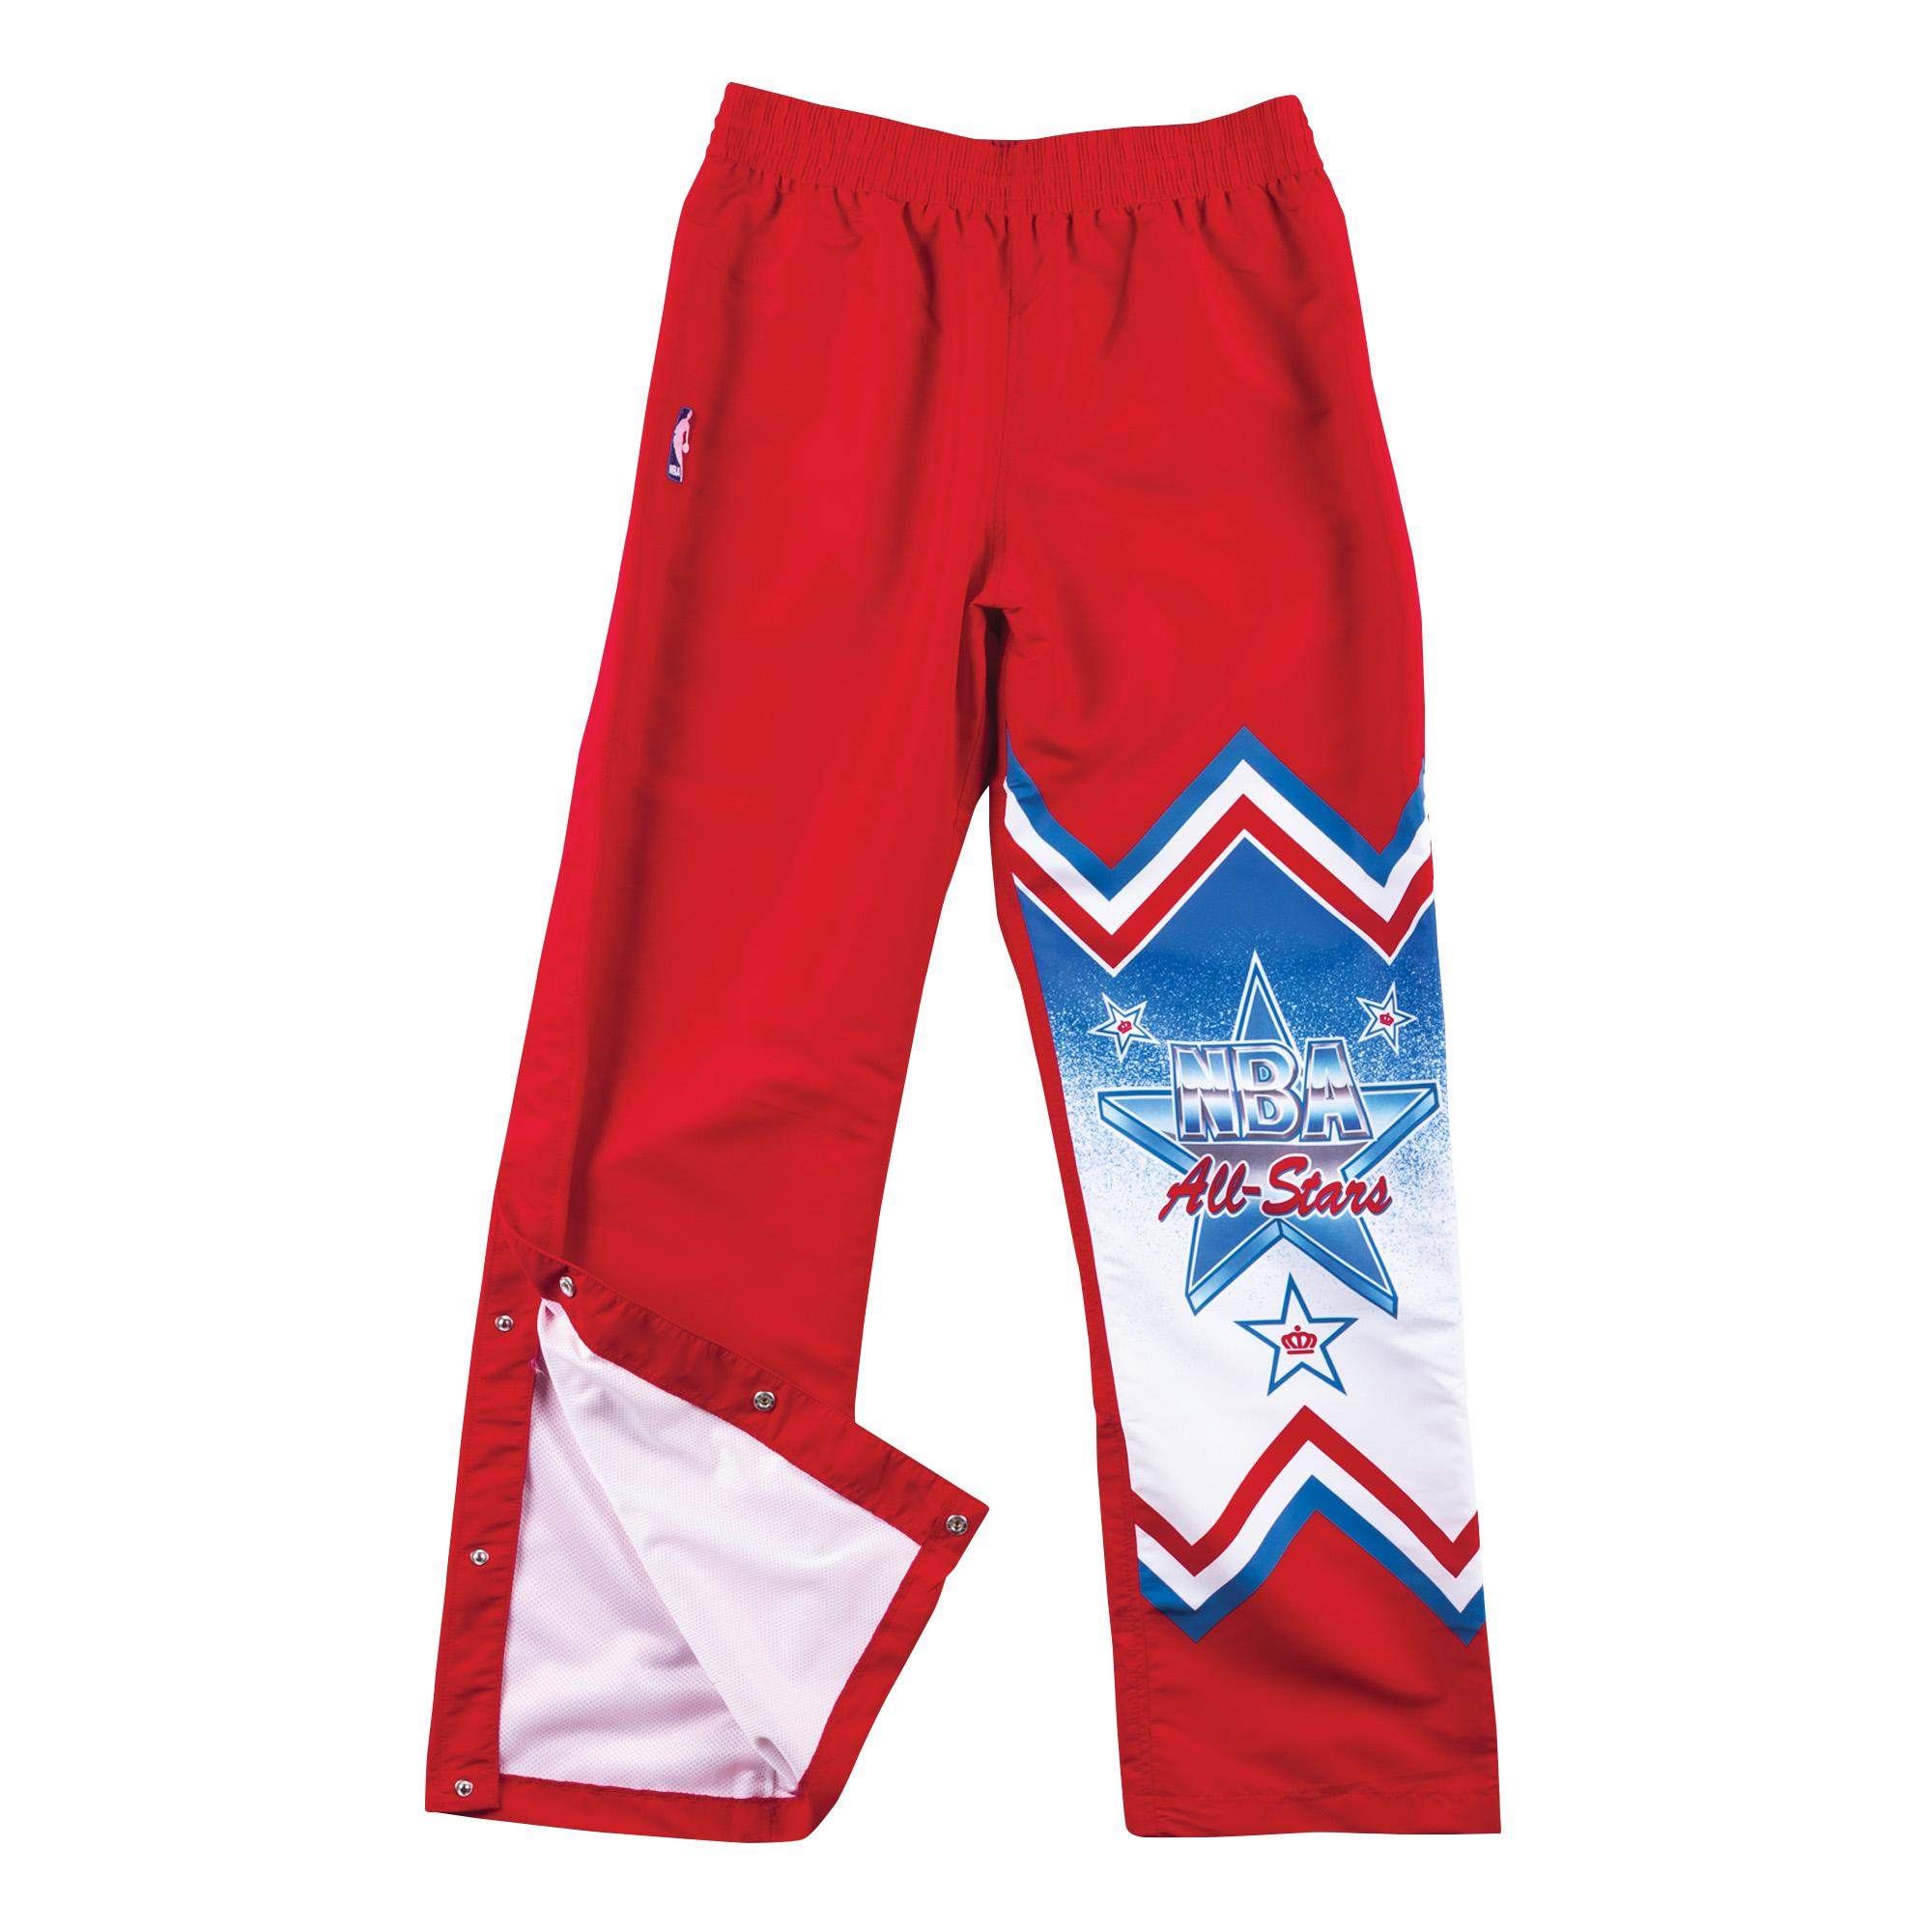 Authentic Warm Up Pants East 1991